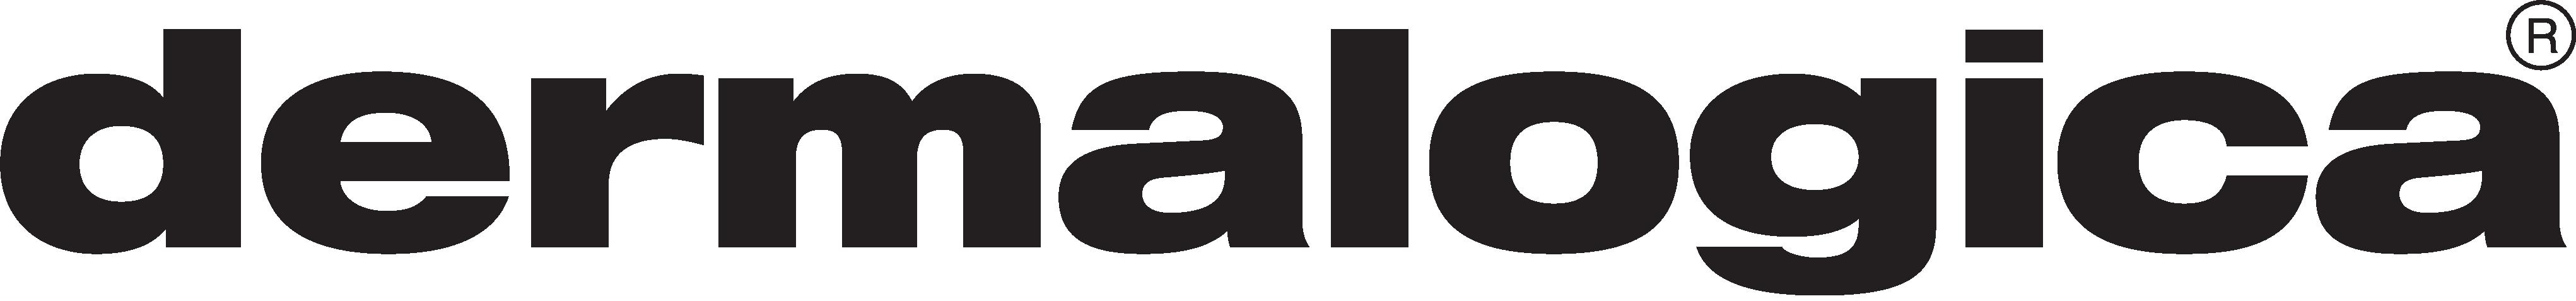 dermalogica-logo-black-no-idi.png